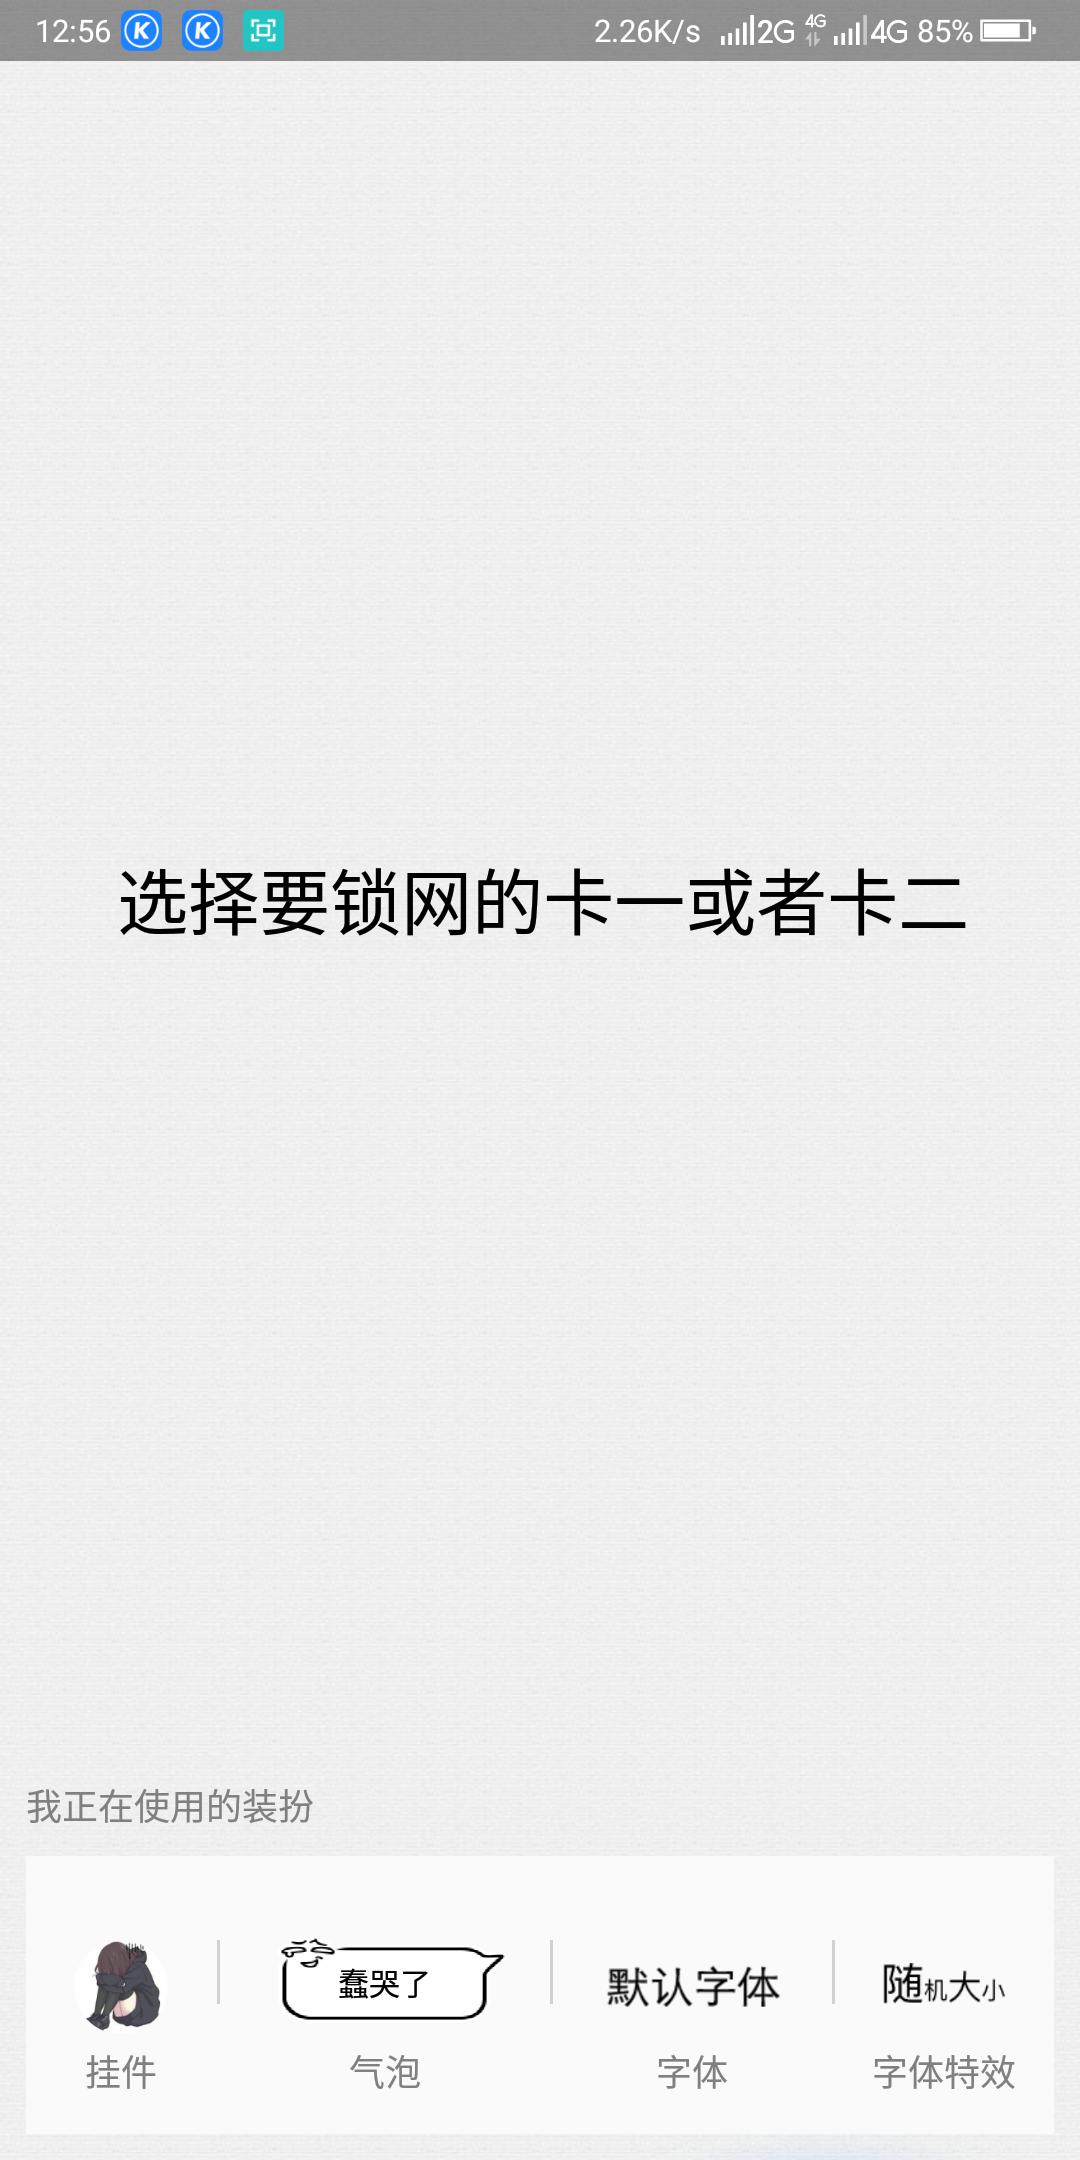 Screenshot_2018-06-19-12-56-43.png